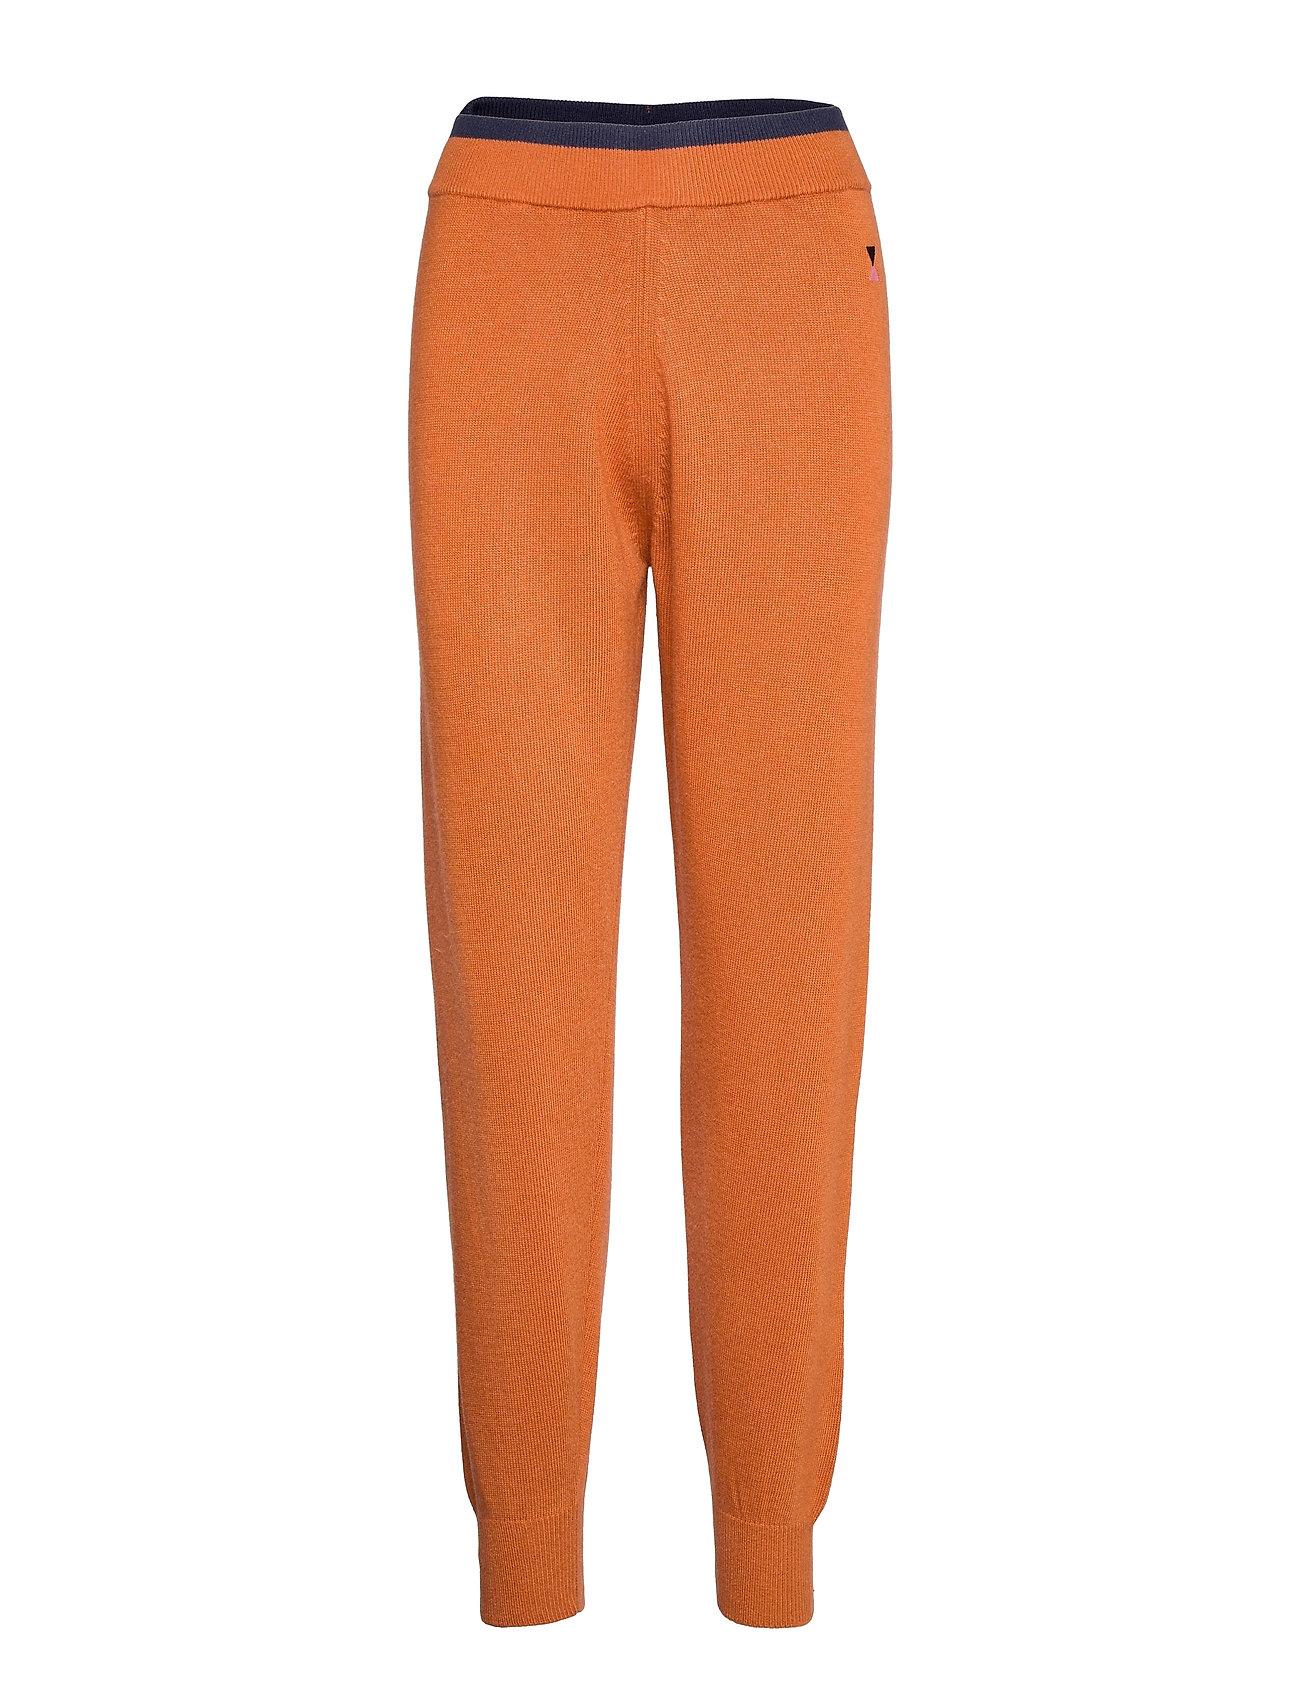 Rib Knitted Pants Casual Bukser Orange Bobo Choses